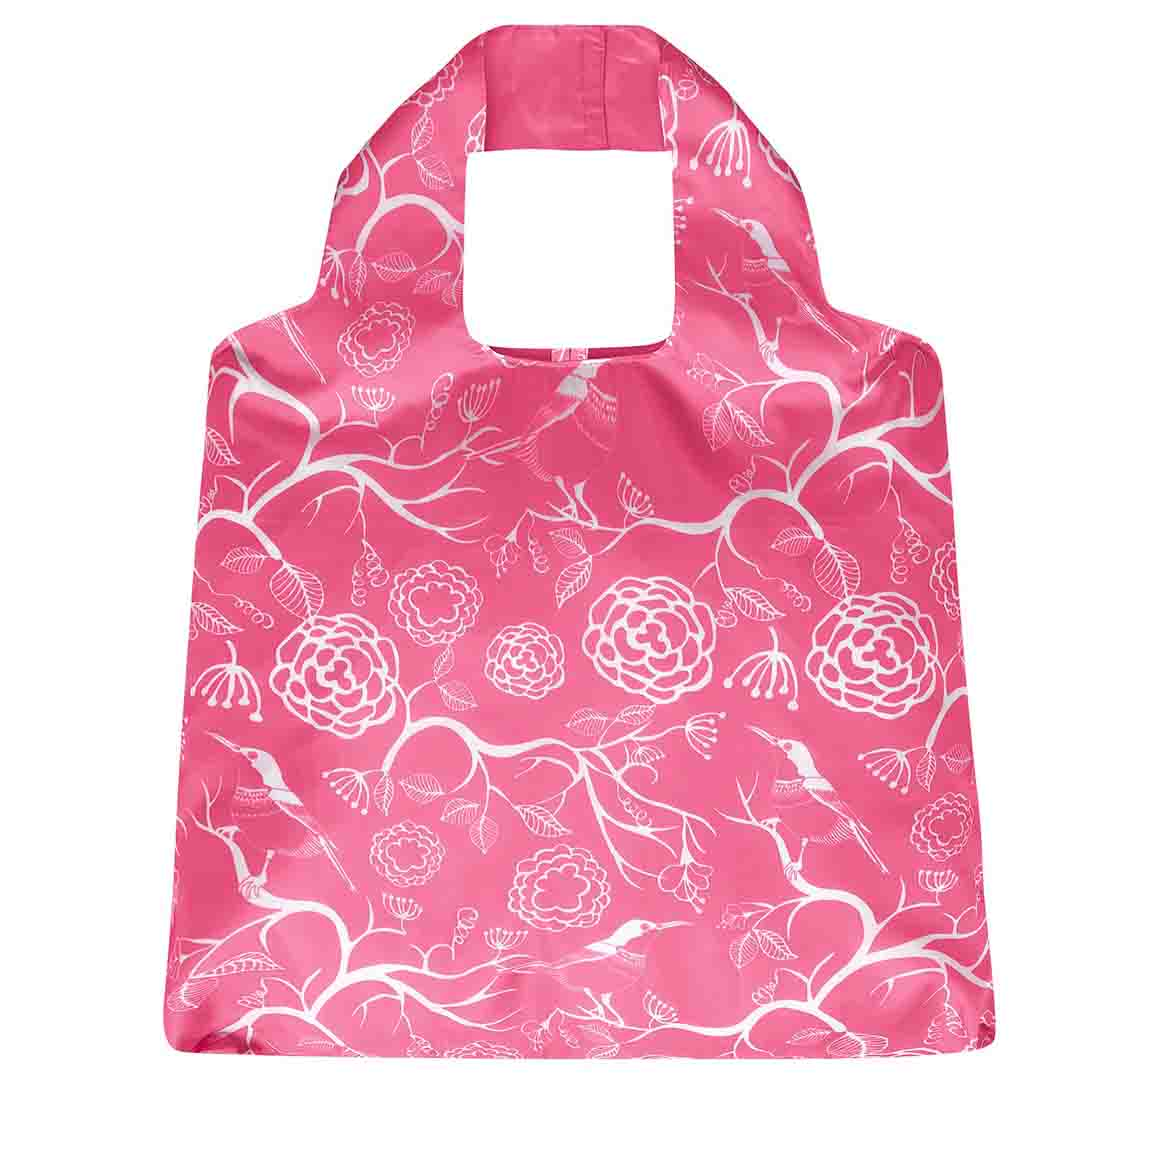 Sunbird SAKitToMe Foldable Shopping Bag  | Trada Marketplace